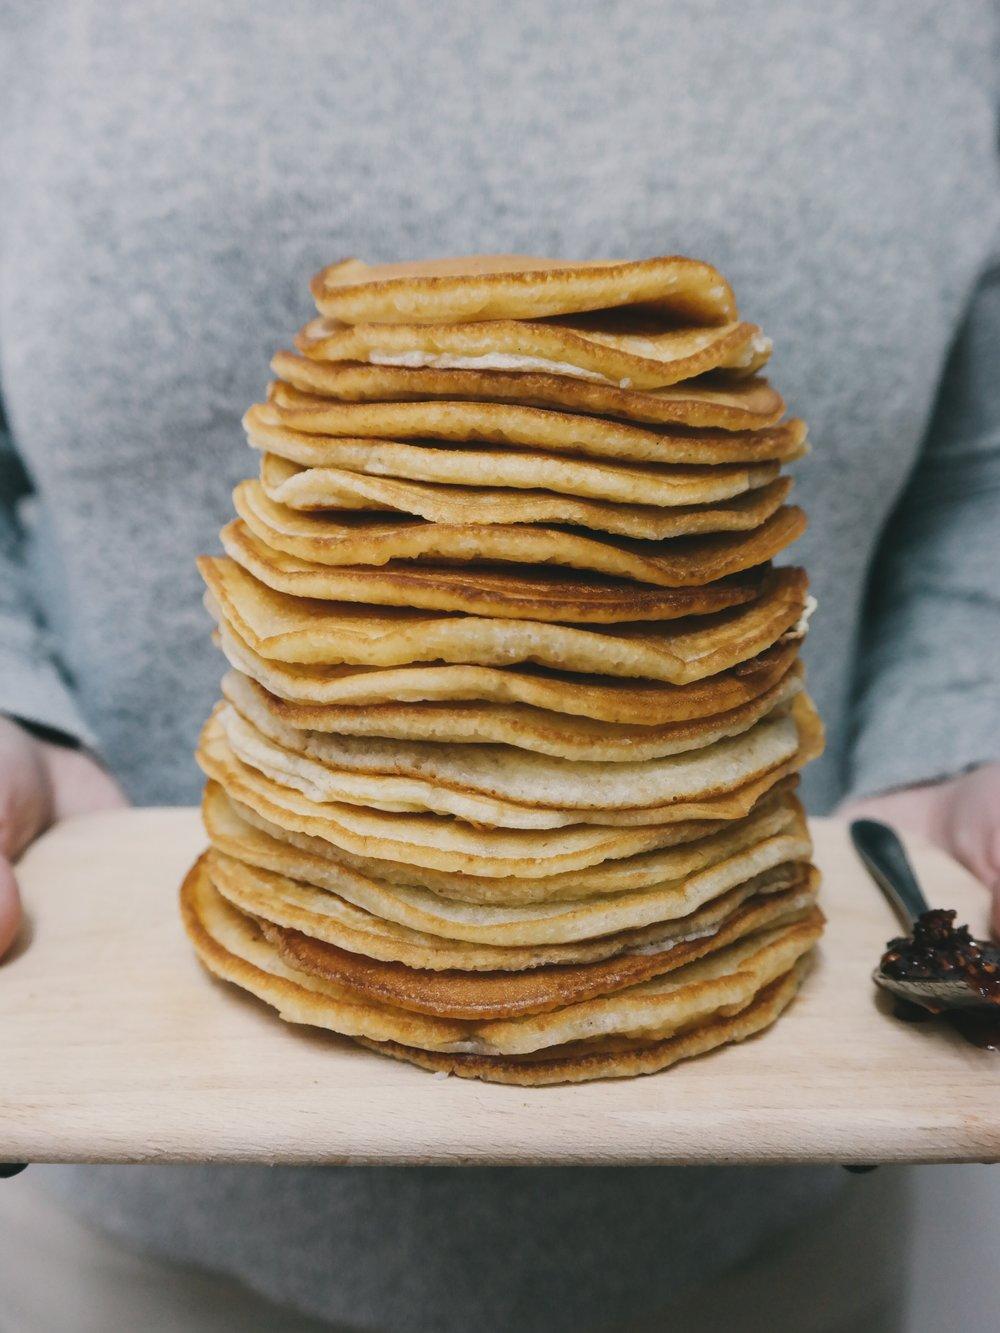 Men's Breakfast - Every Saturday 7:00-9:00am